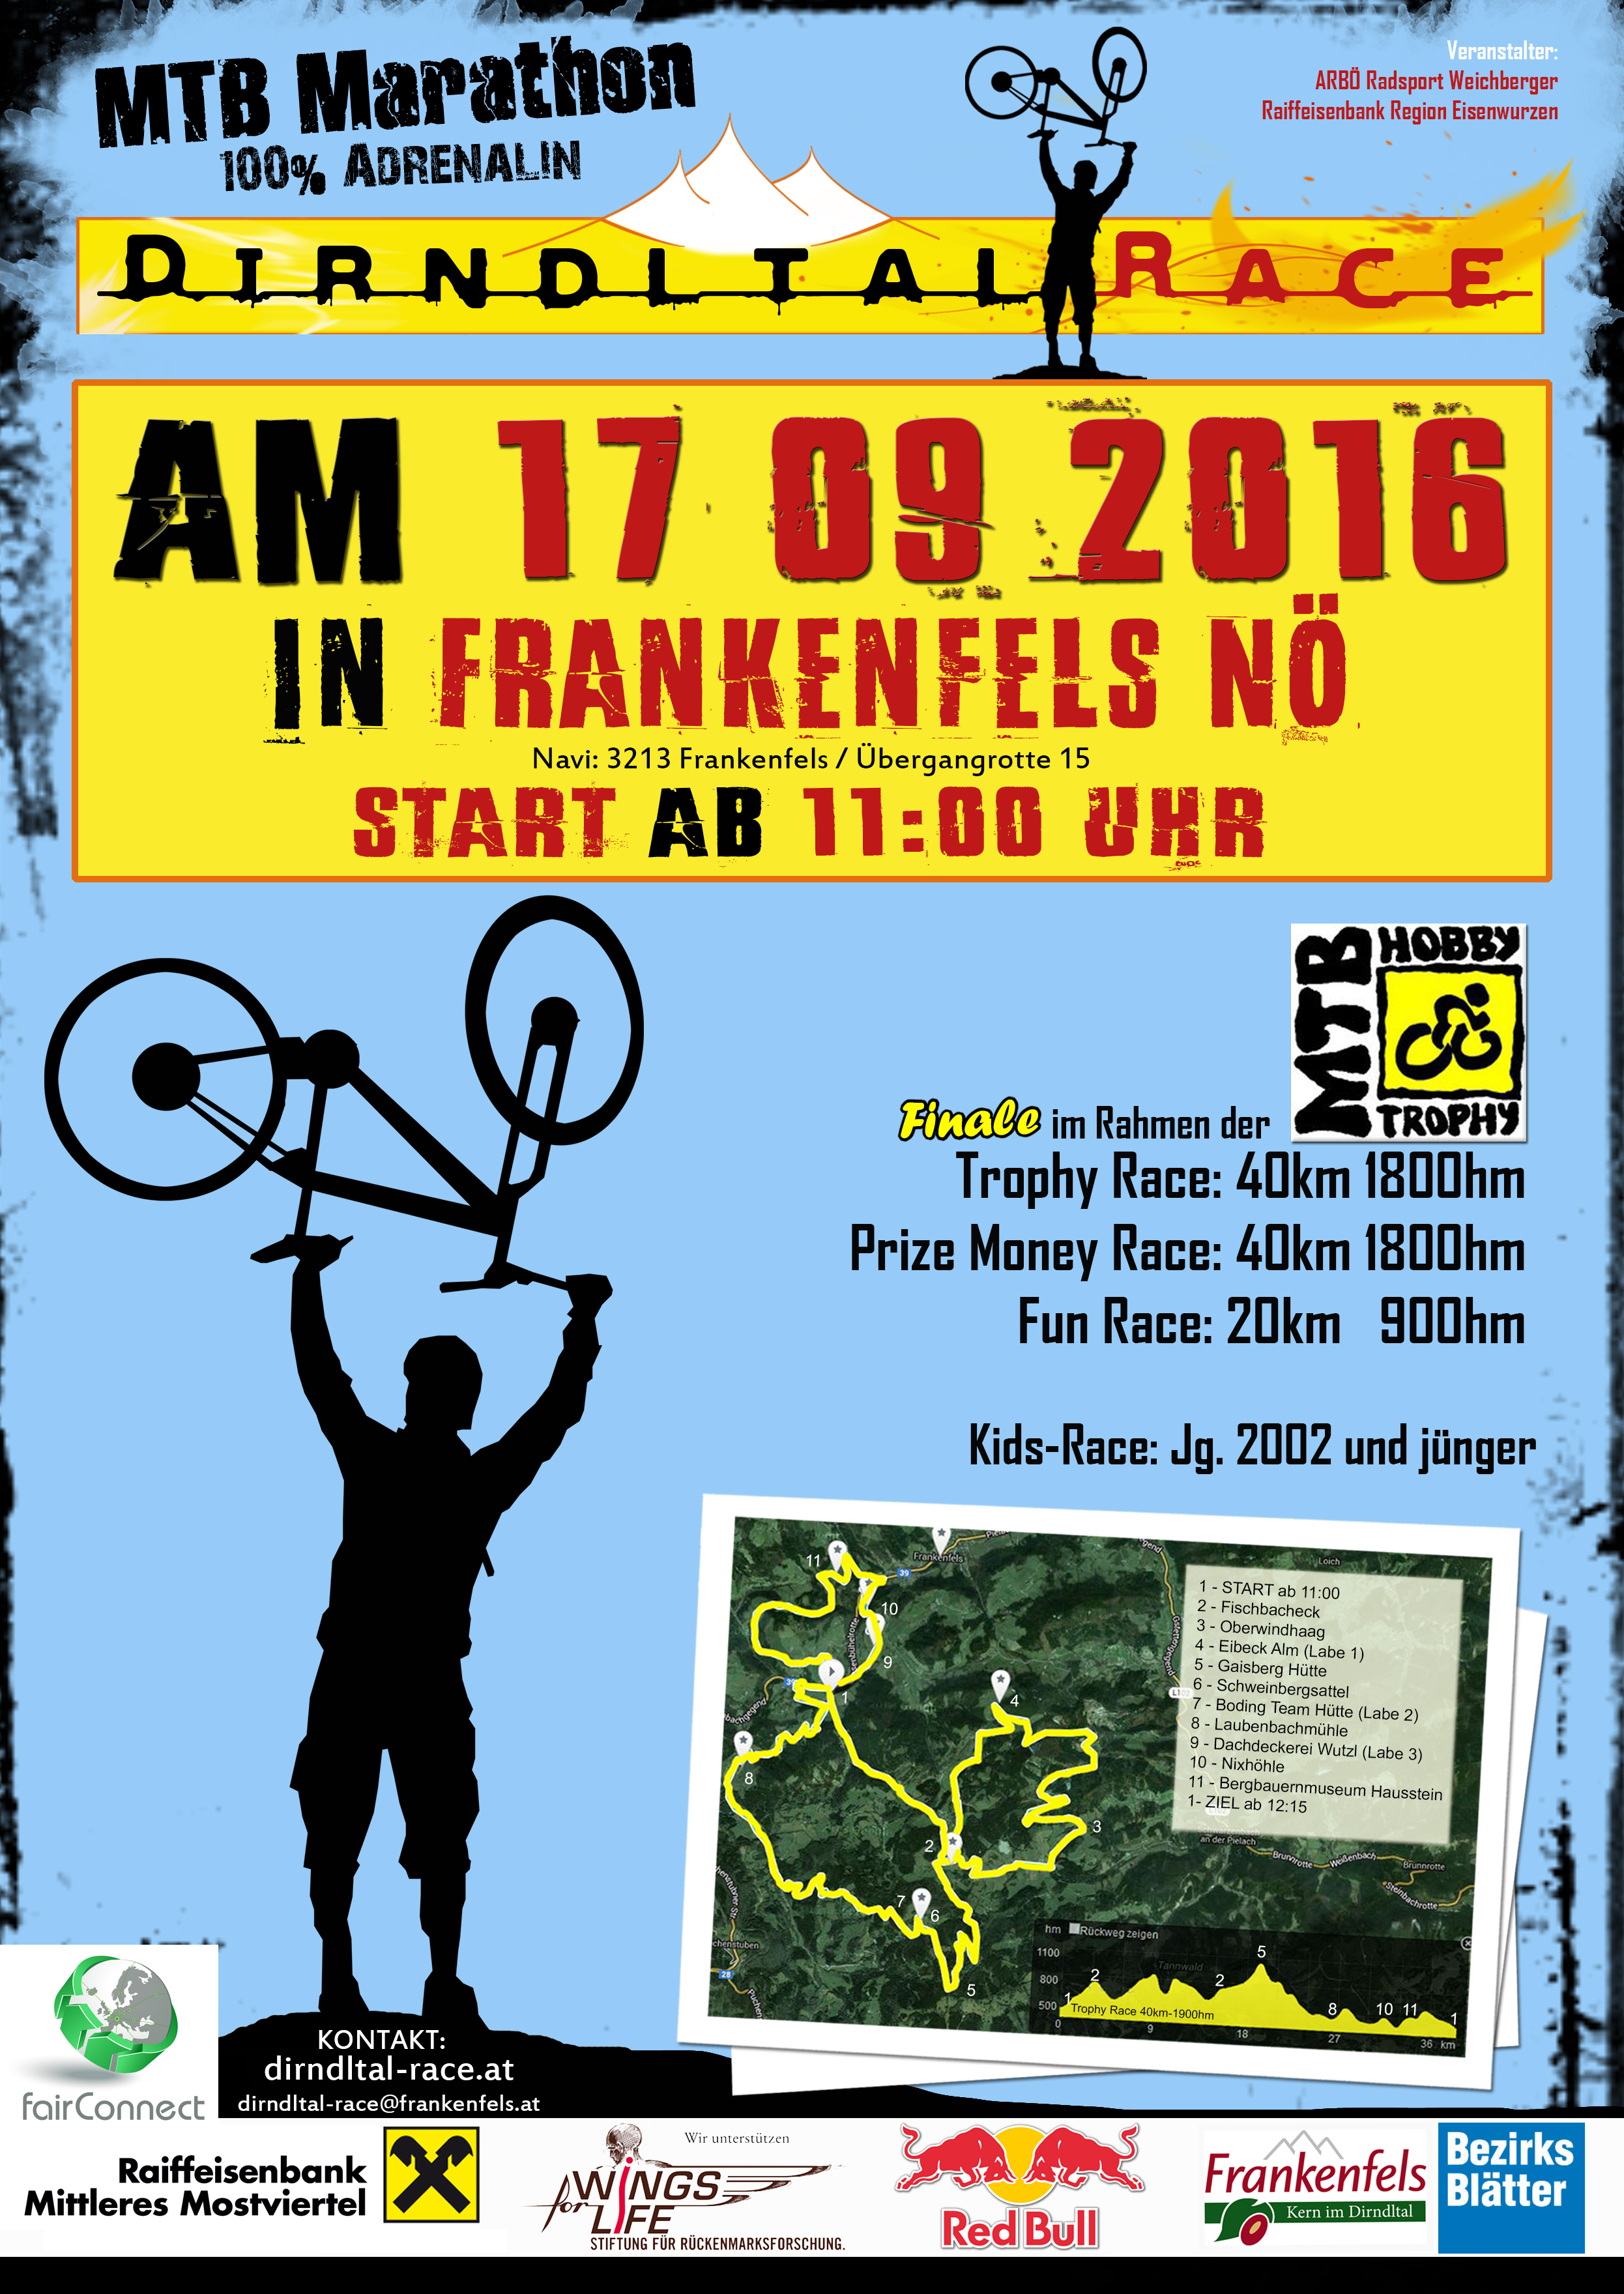 DTR Plakat A2 2016 V3 (002)